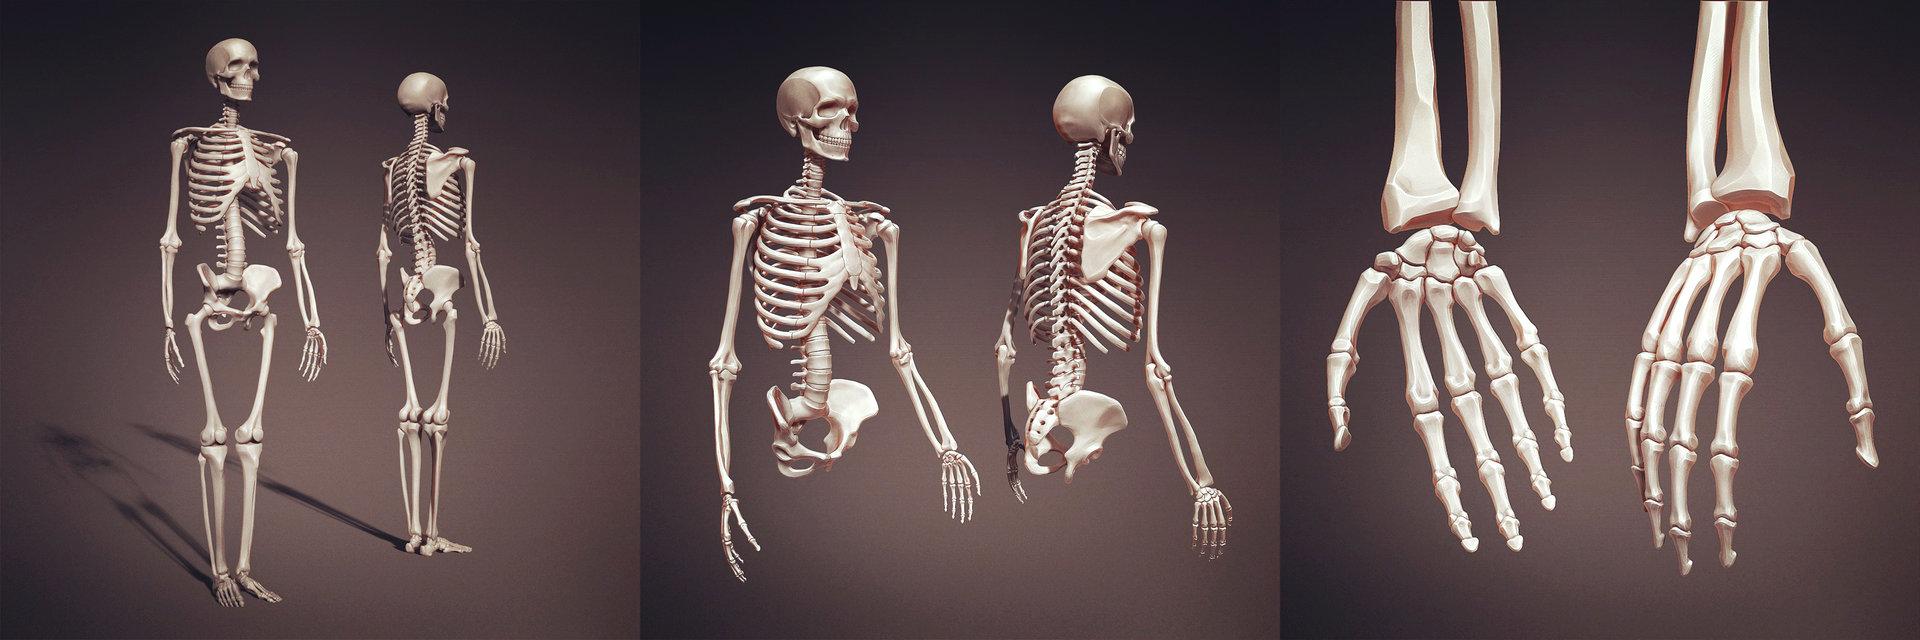 Leonid kuzyakin cuba 0011 skeleton study22